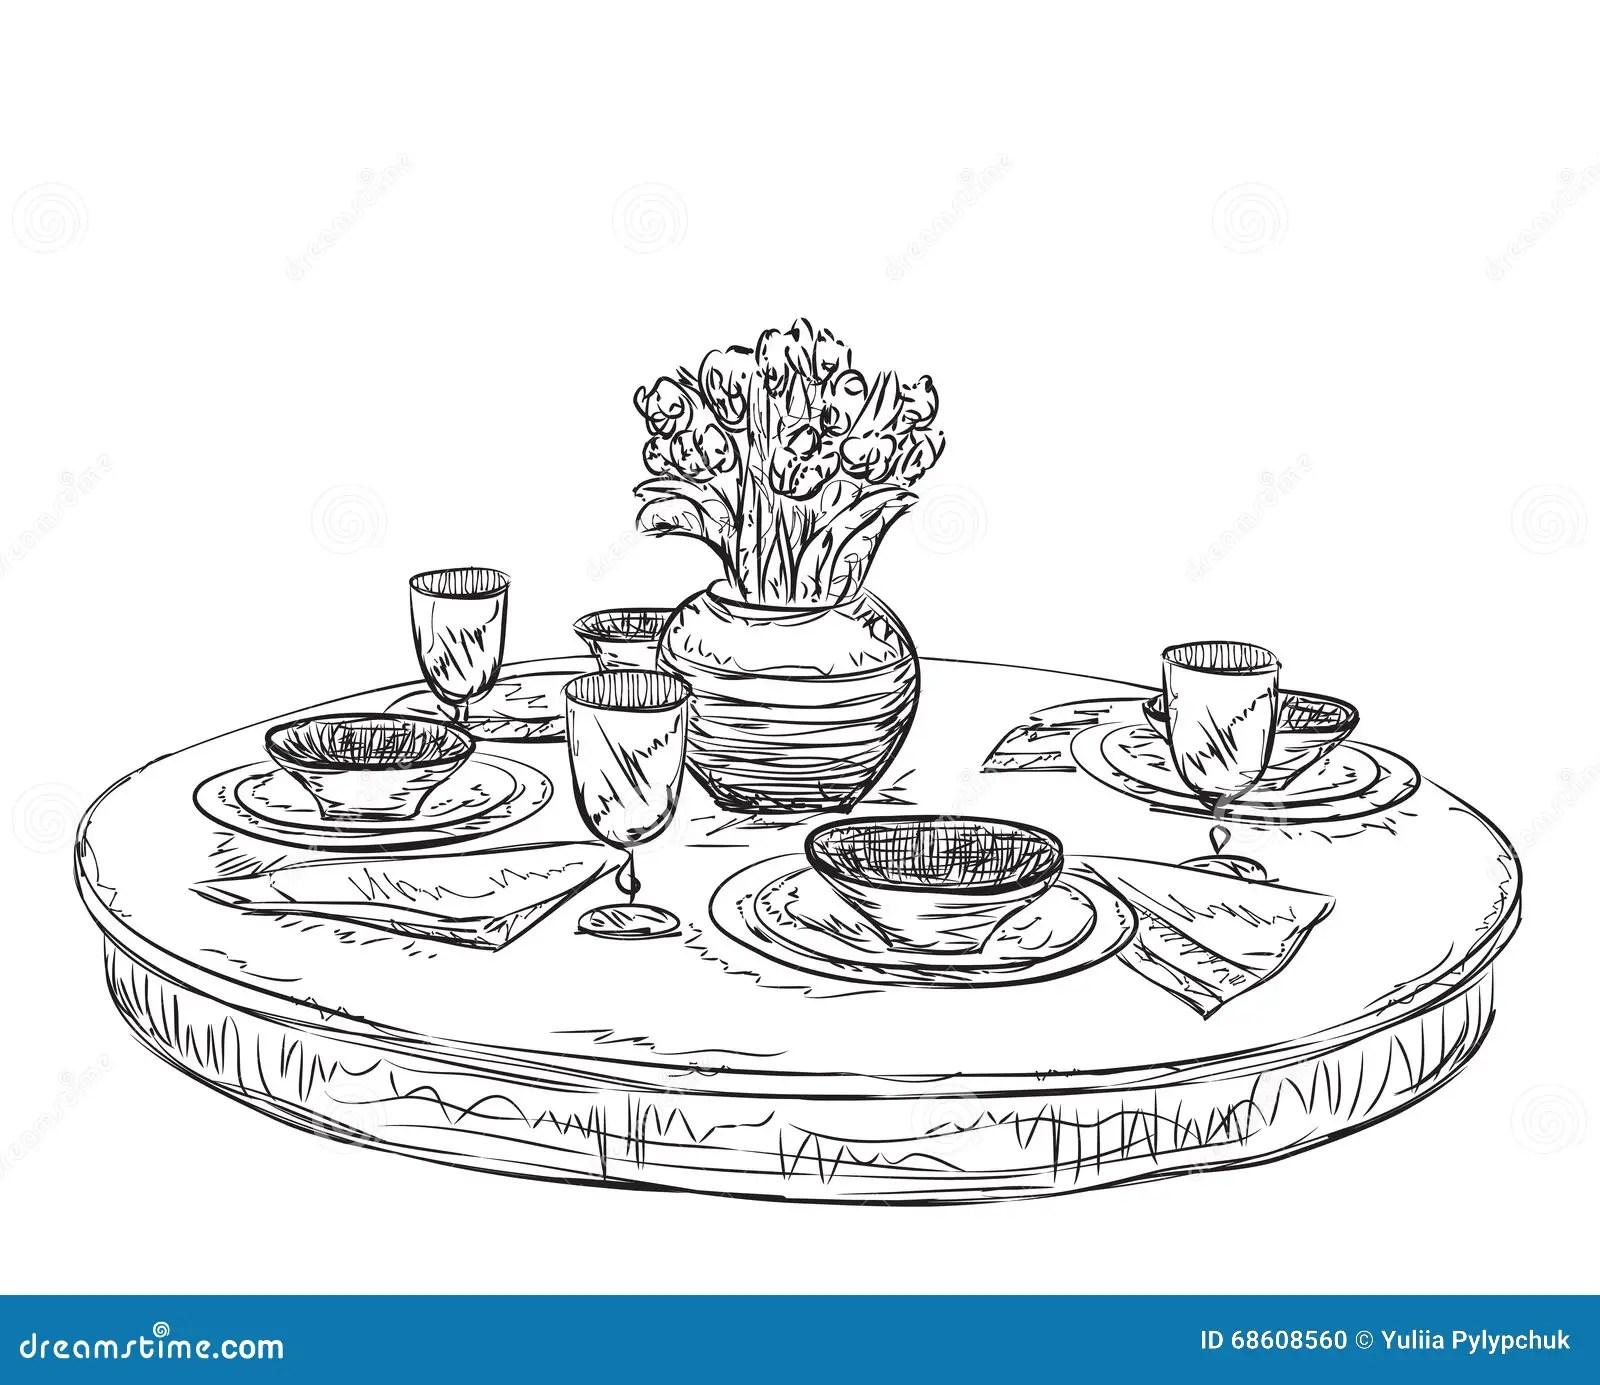 Table Setting Set Weekend Breakfast Or Dinner Stock